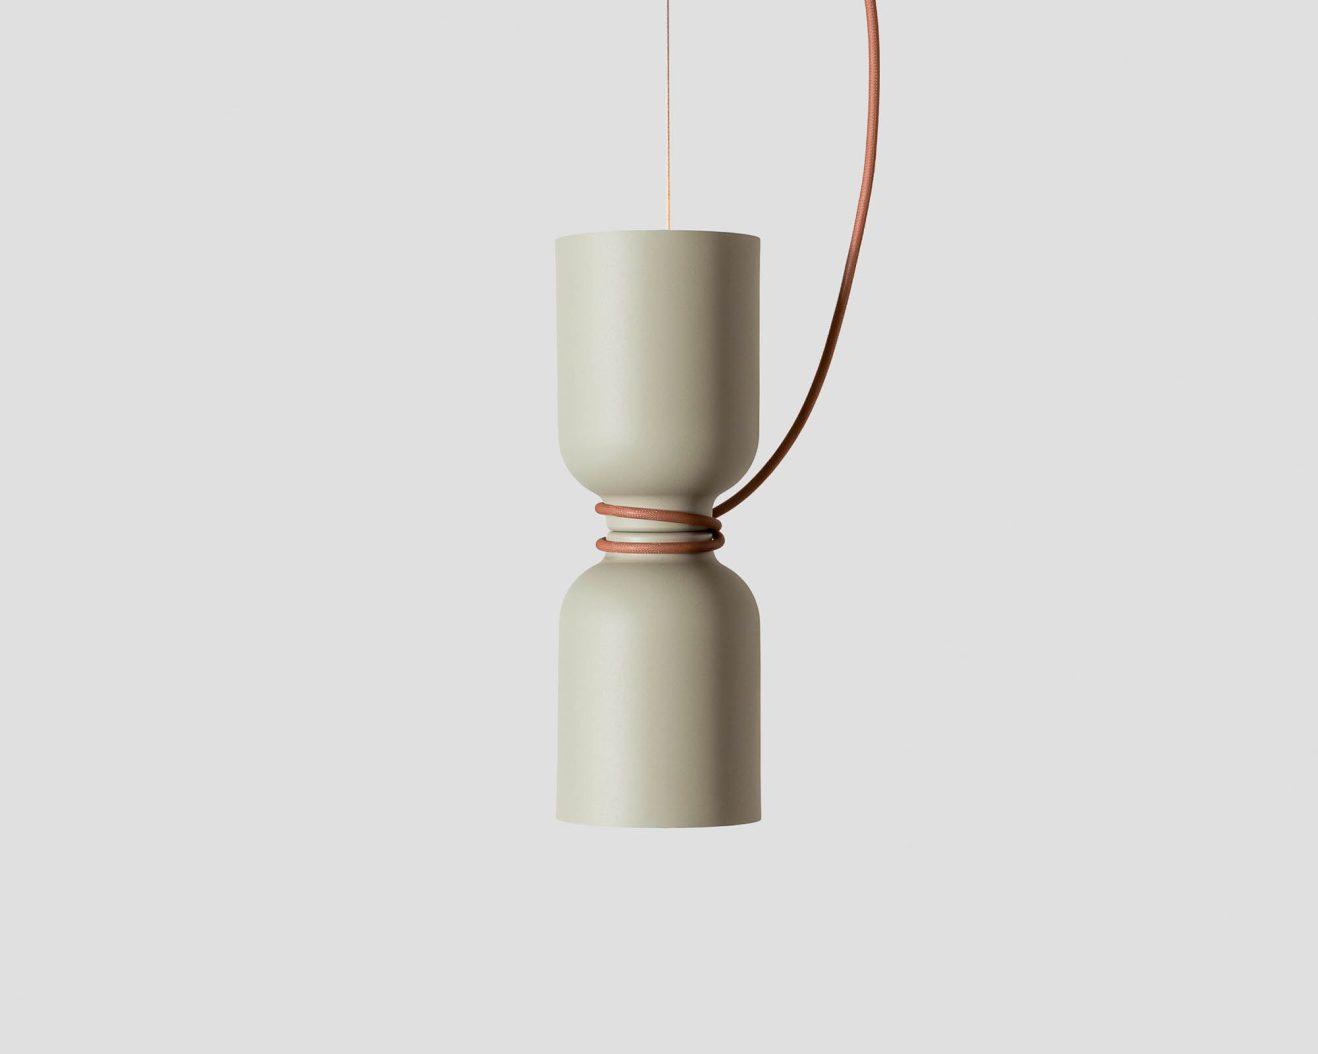 Andlight-Pendant-Lamp-CC-Sage-Savannah Bay Gallery